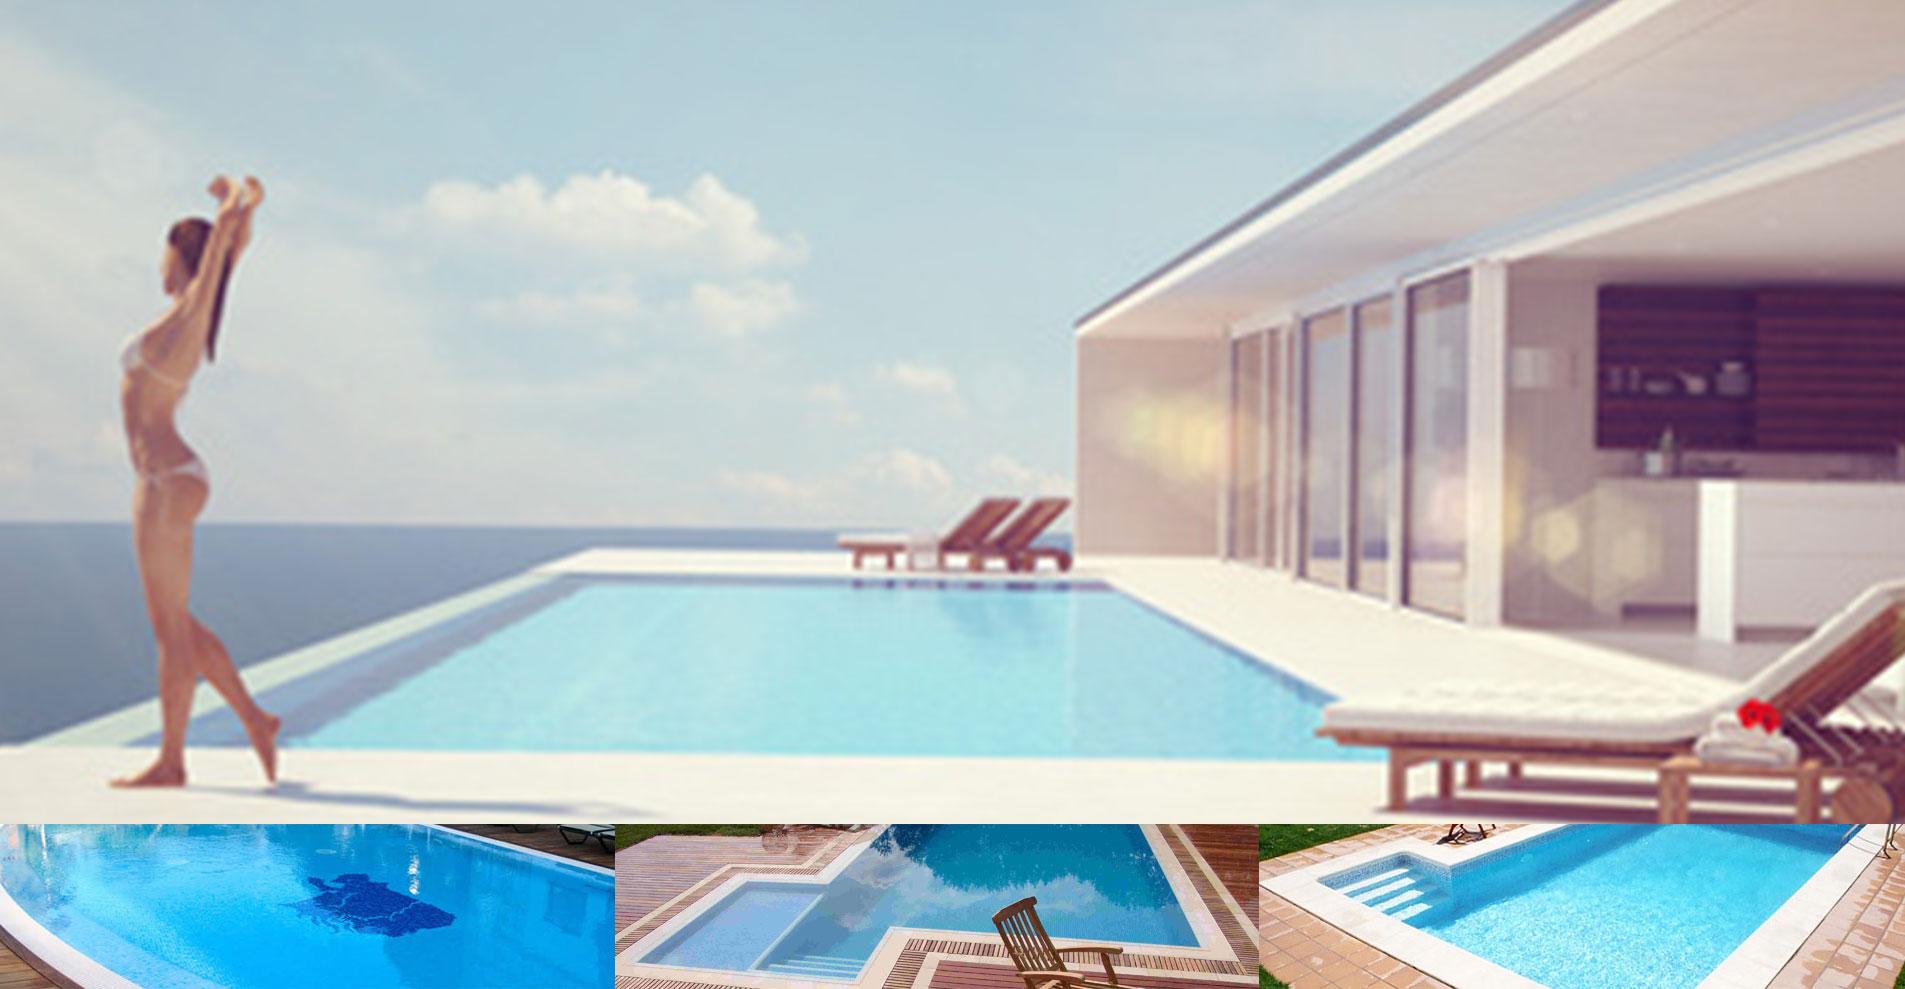 Oferta piscina 8x4 - Costo piscina 8x4 ...